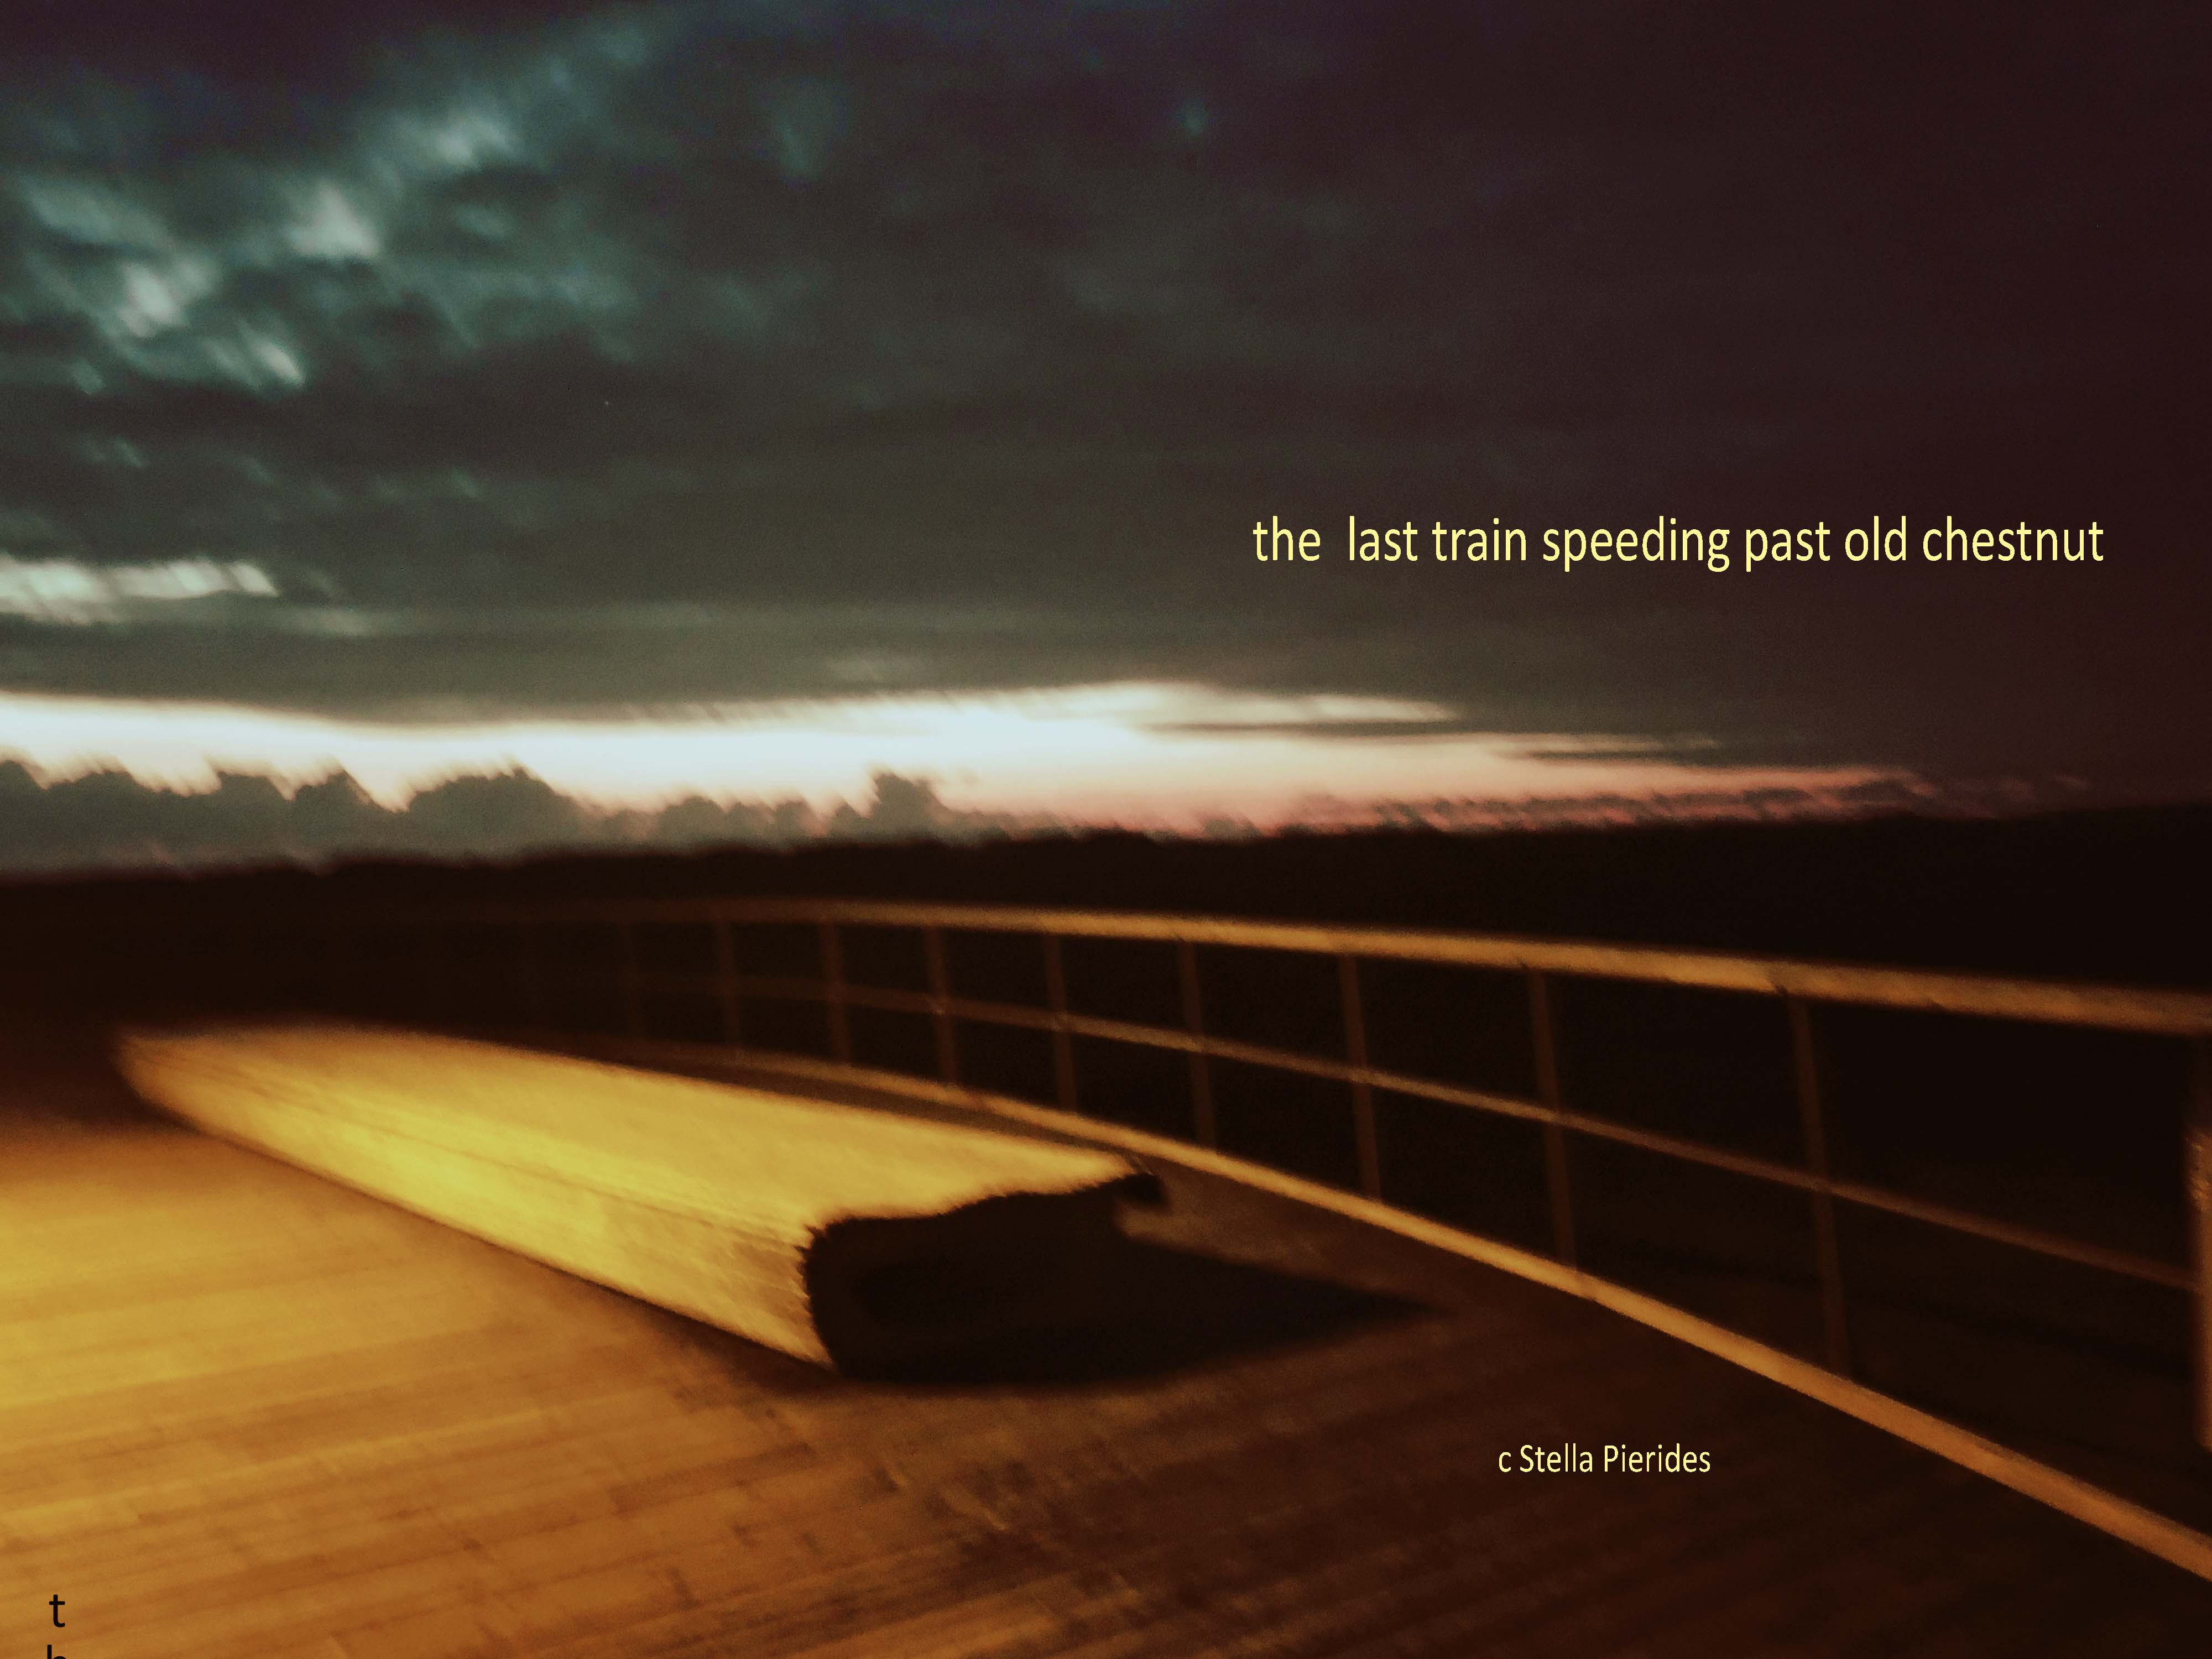 'the last train'